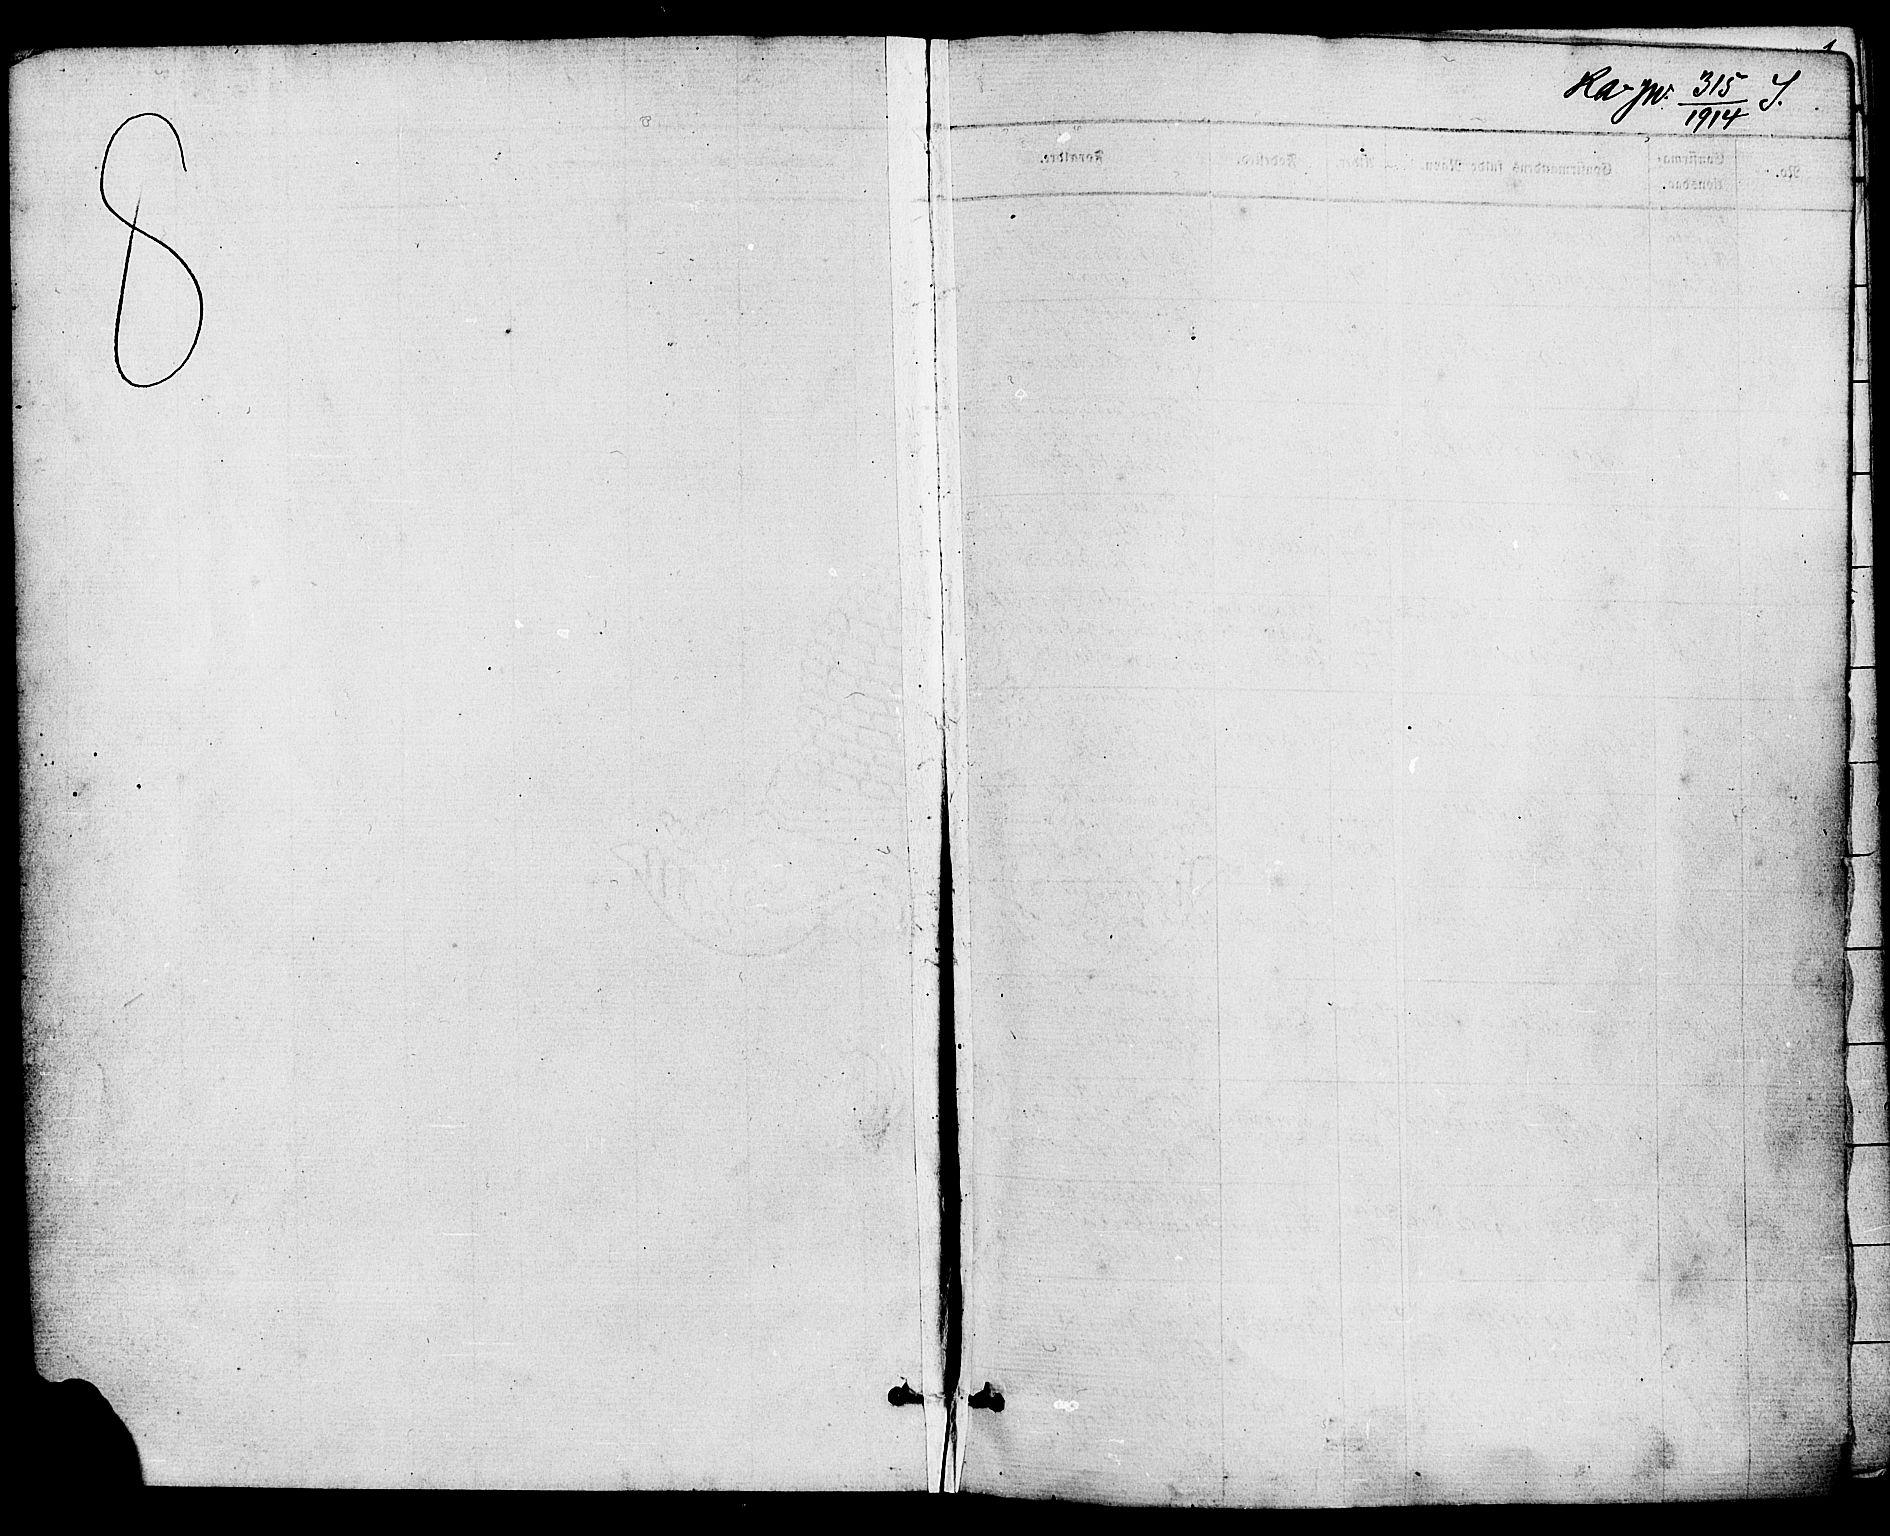 SAKO, Kragerø kirkebøker, F/Fa/L0008: Ministerialbok nr. 8, 1856-1880